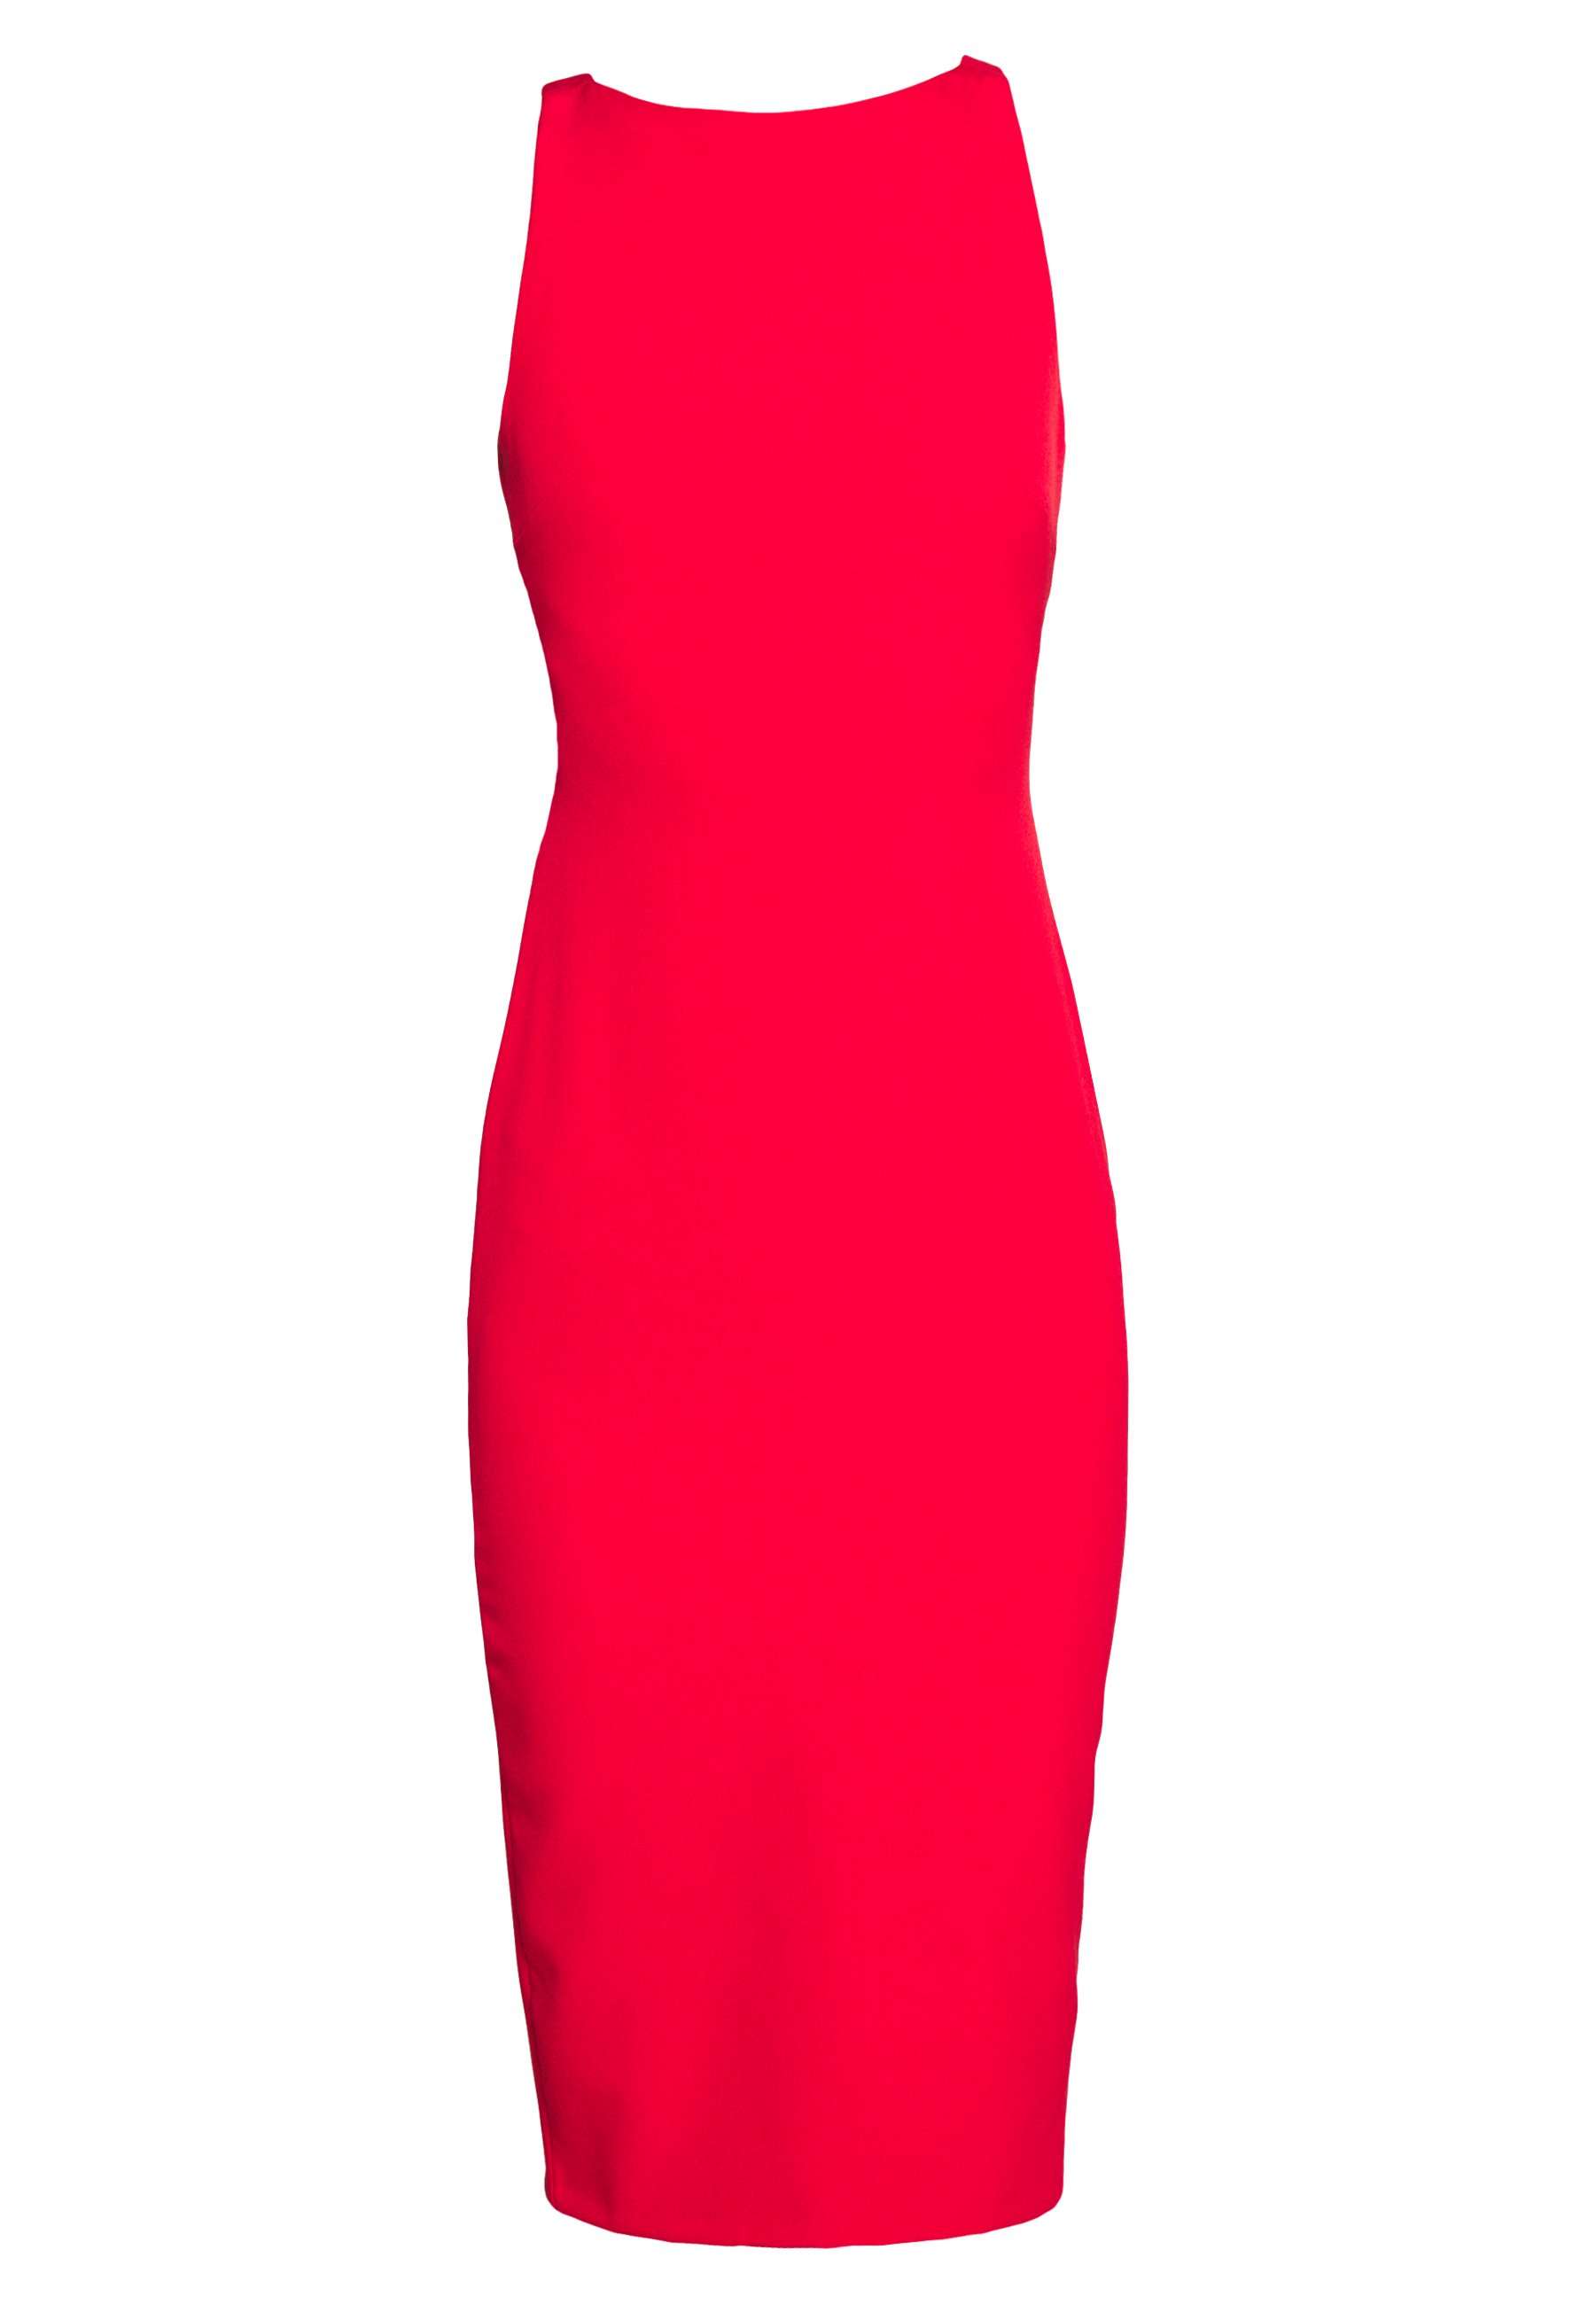 Trendyol Kirmizi - Shift Dress Red